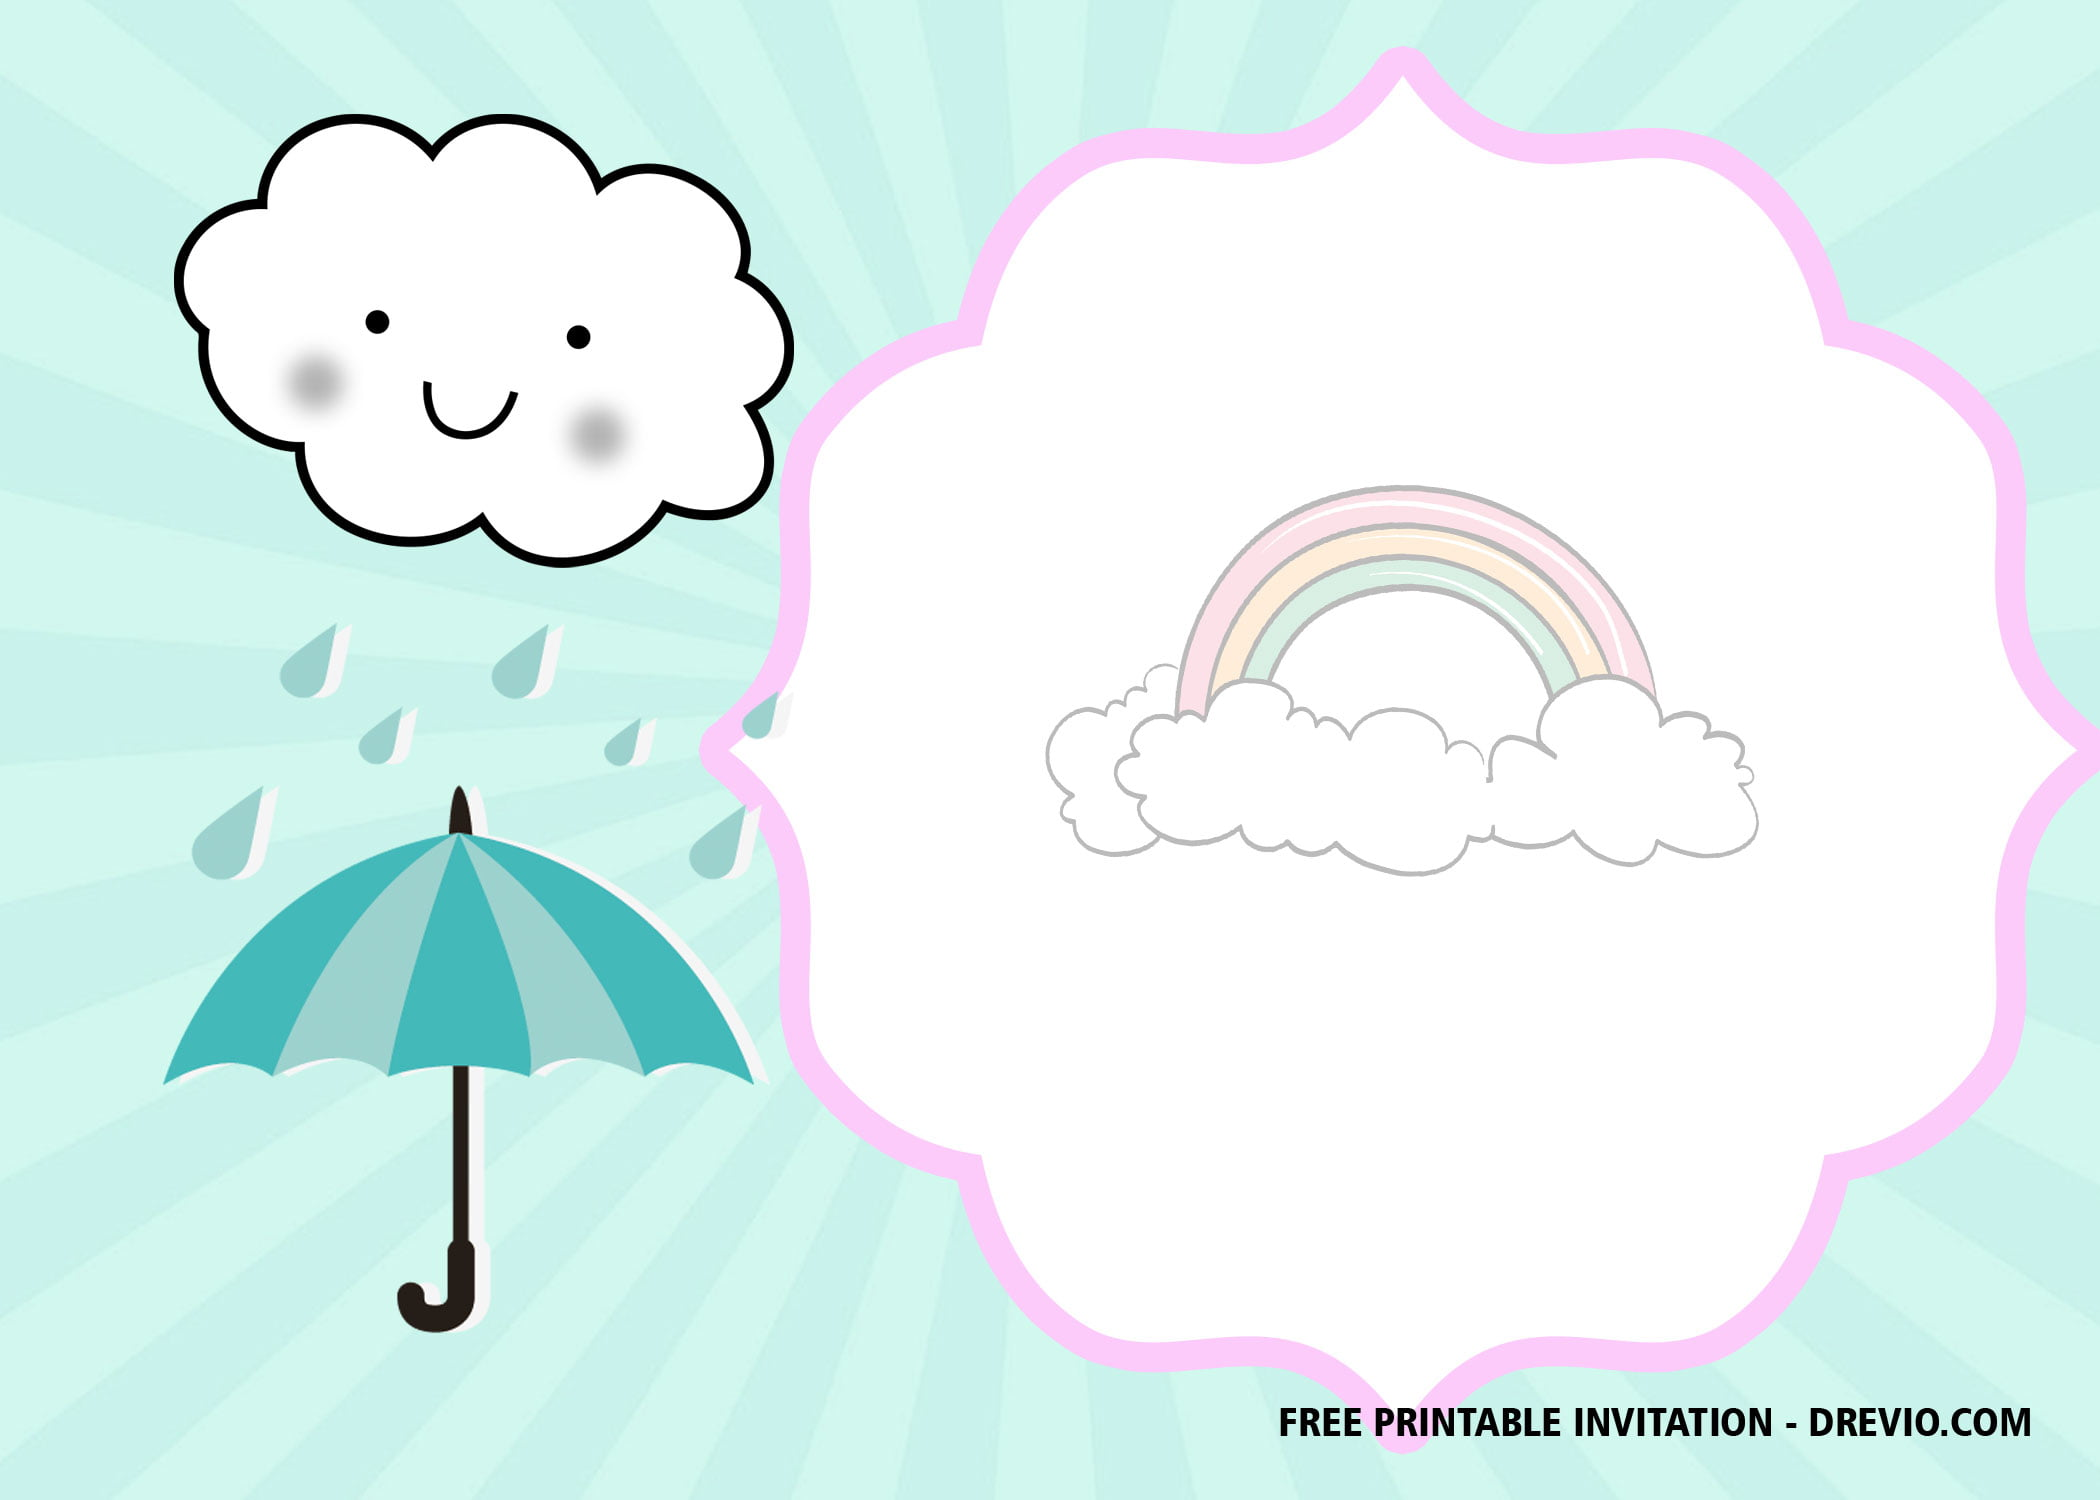 Free Printable Cloud Invitation Templates